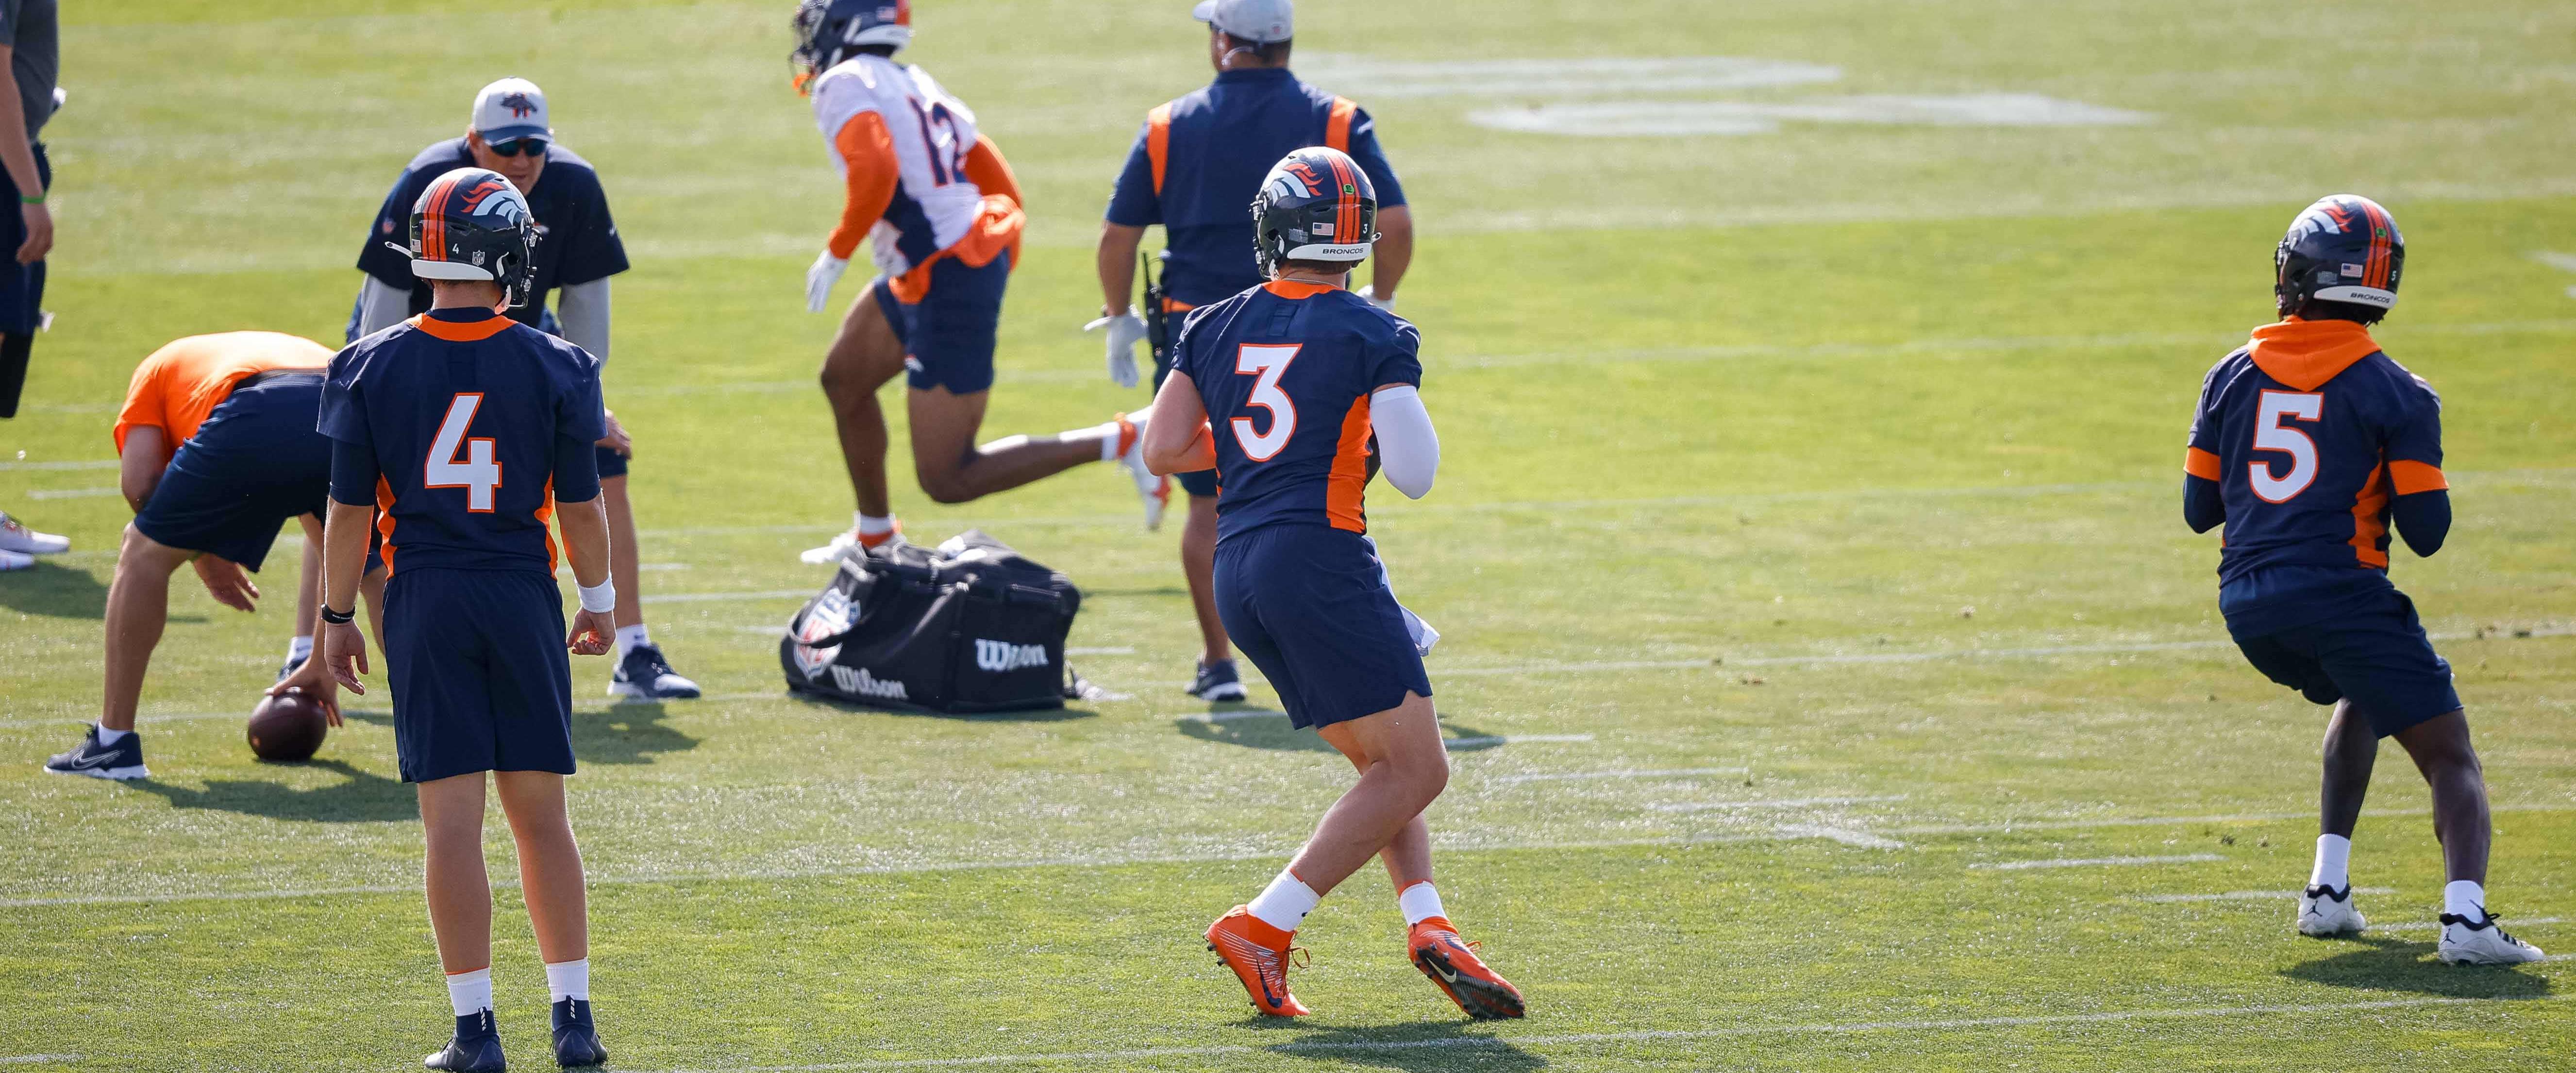 No-brainer: Broncos will start Teddy Bridgewater over Drew Lock